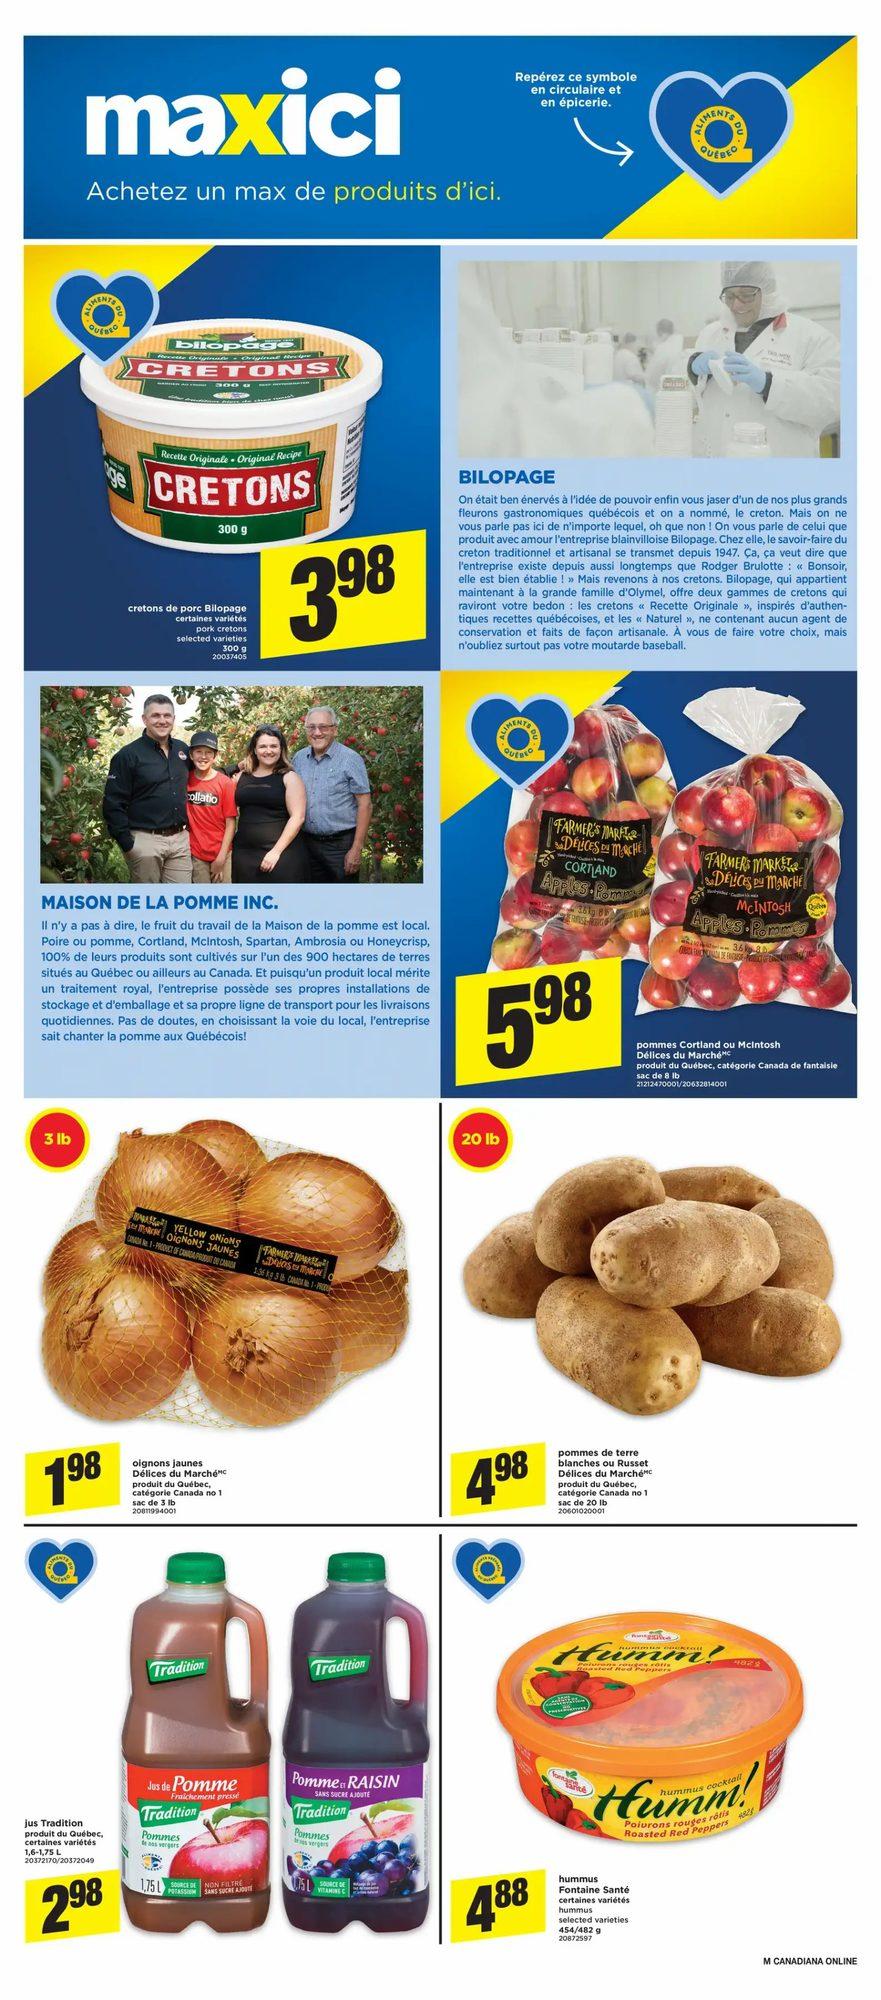 Maxi - Weekly Flyer Specials - Page 3